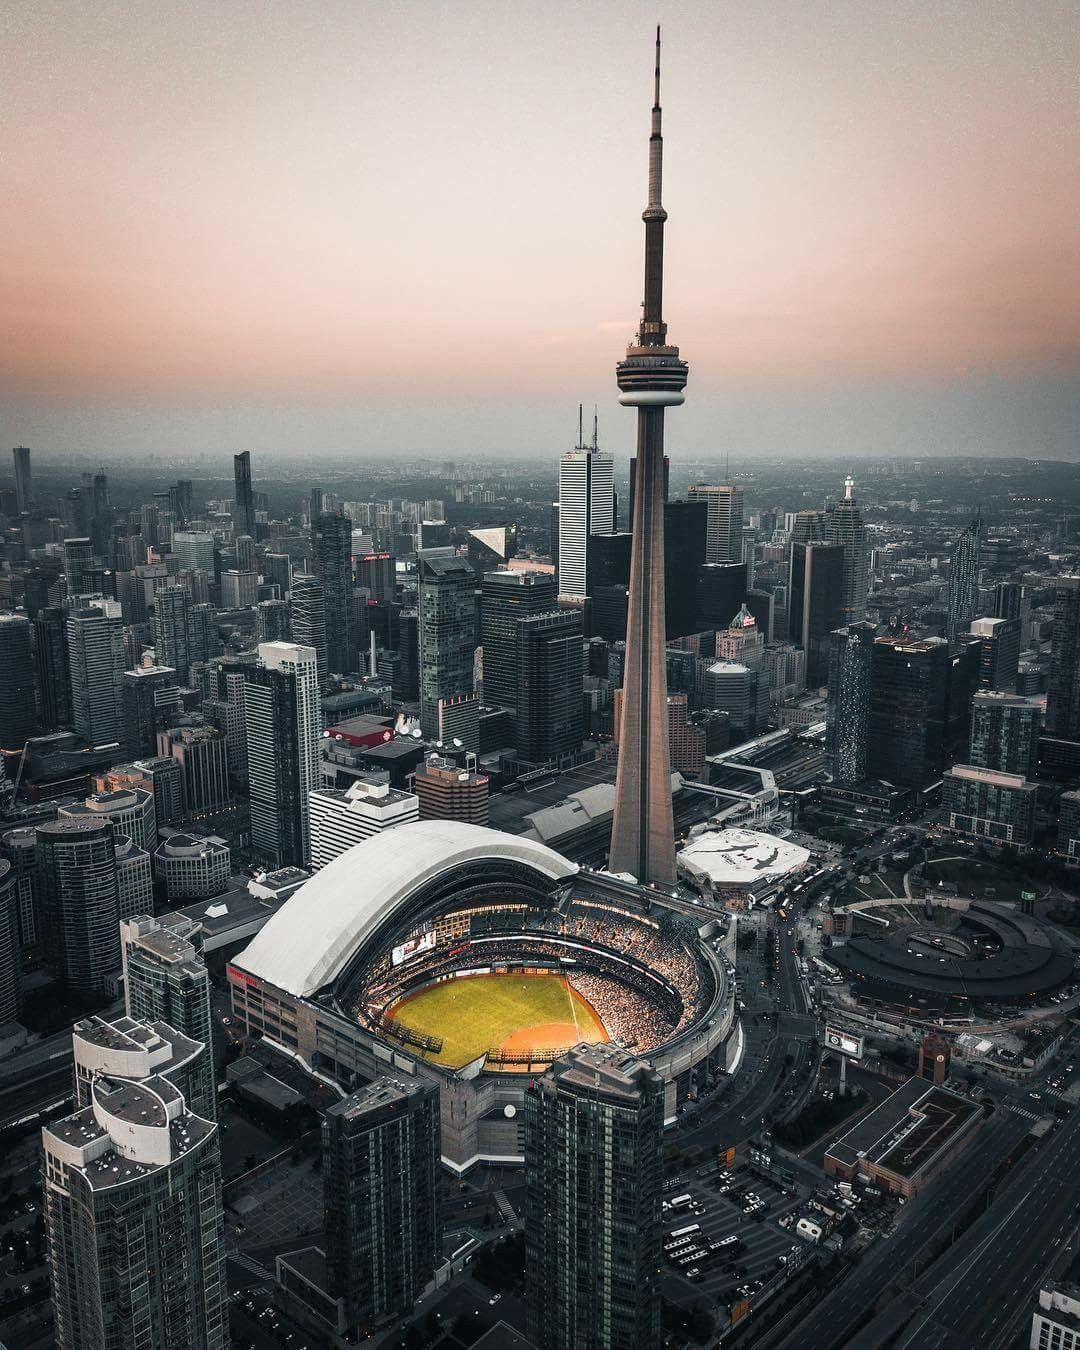 Toronto With The Sky Dome Open For A Toronto Blue Jays Baseball Game Canada City Toronto City Canada Photography